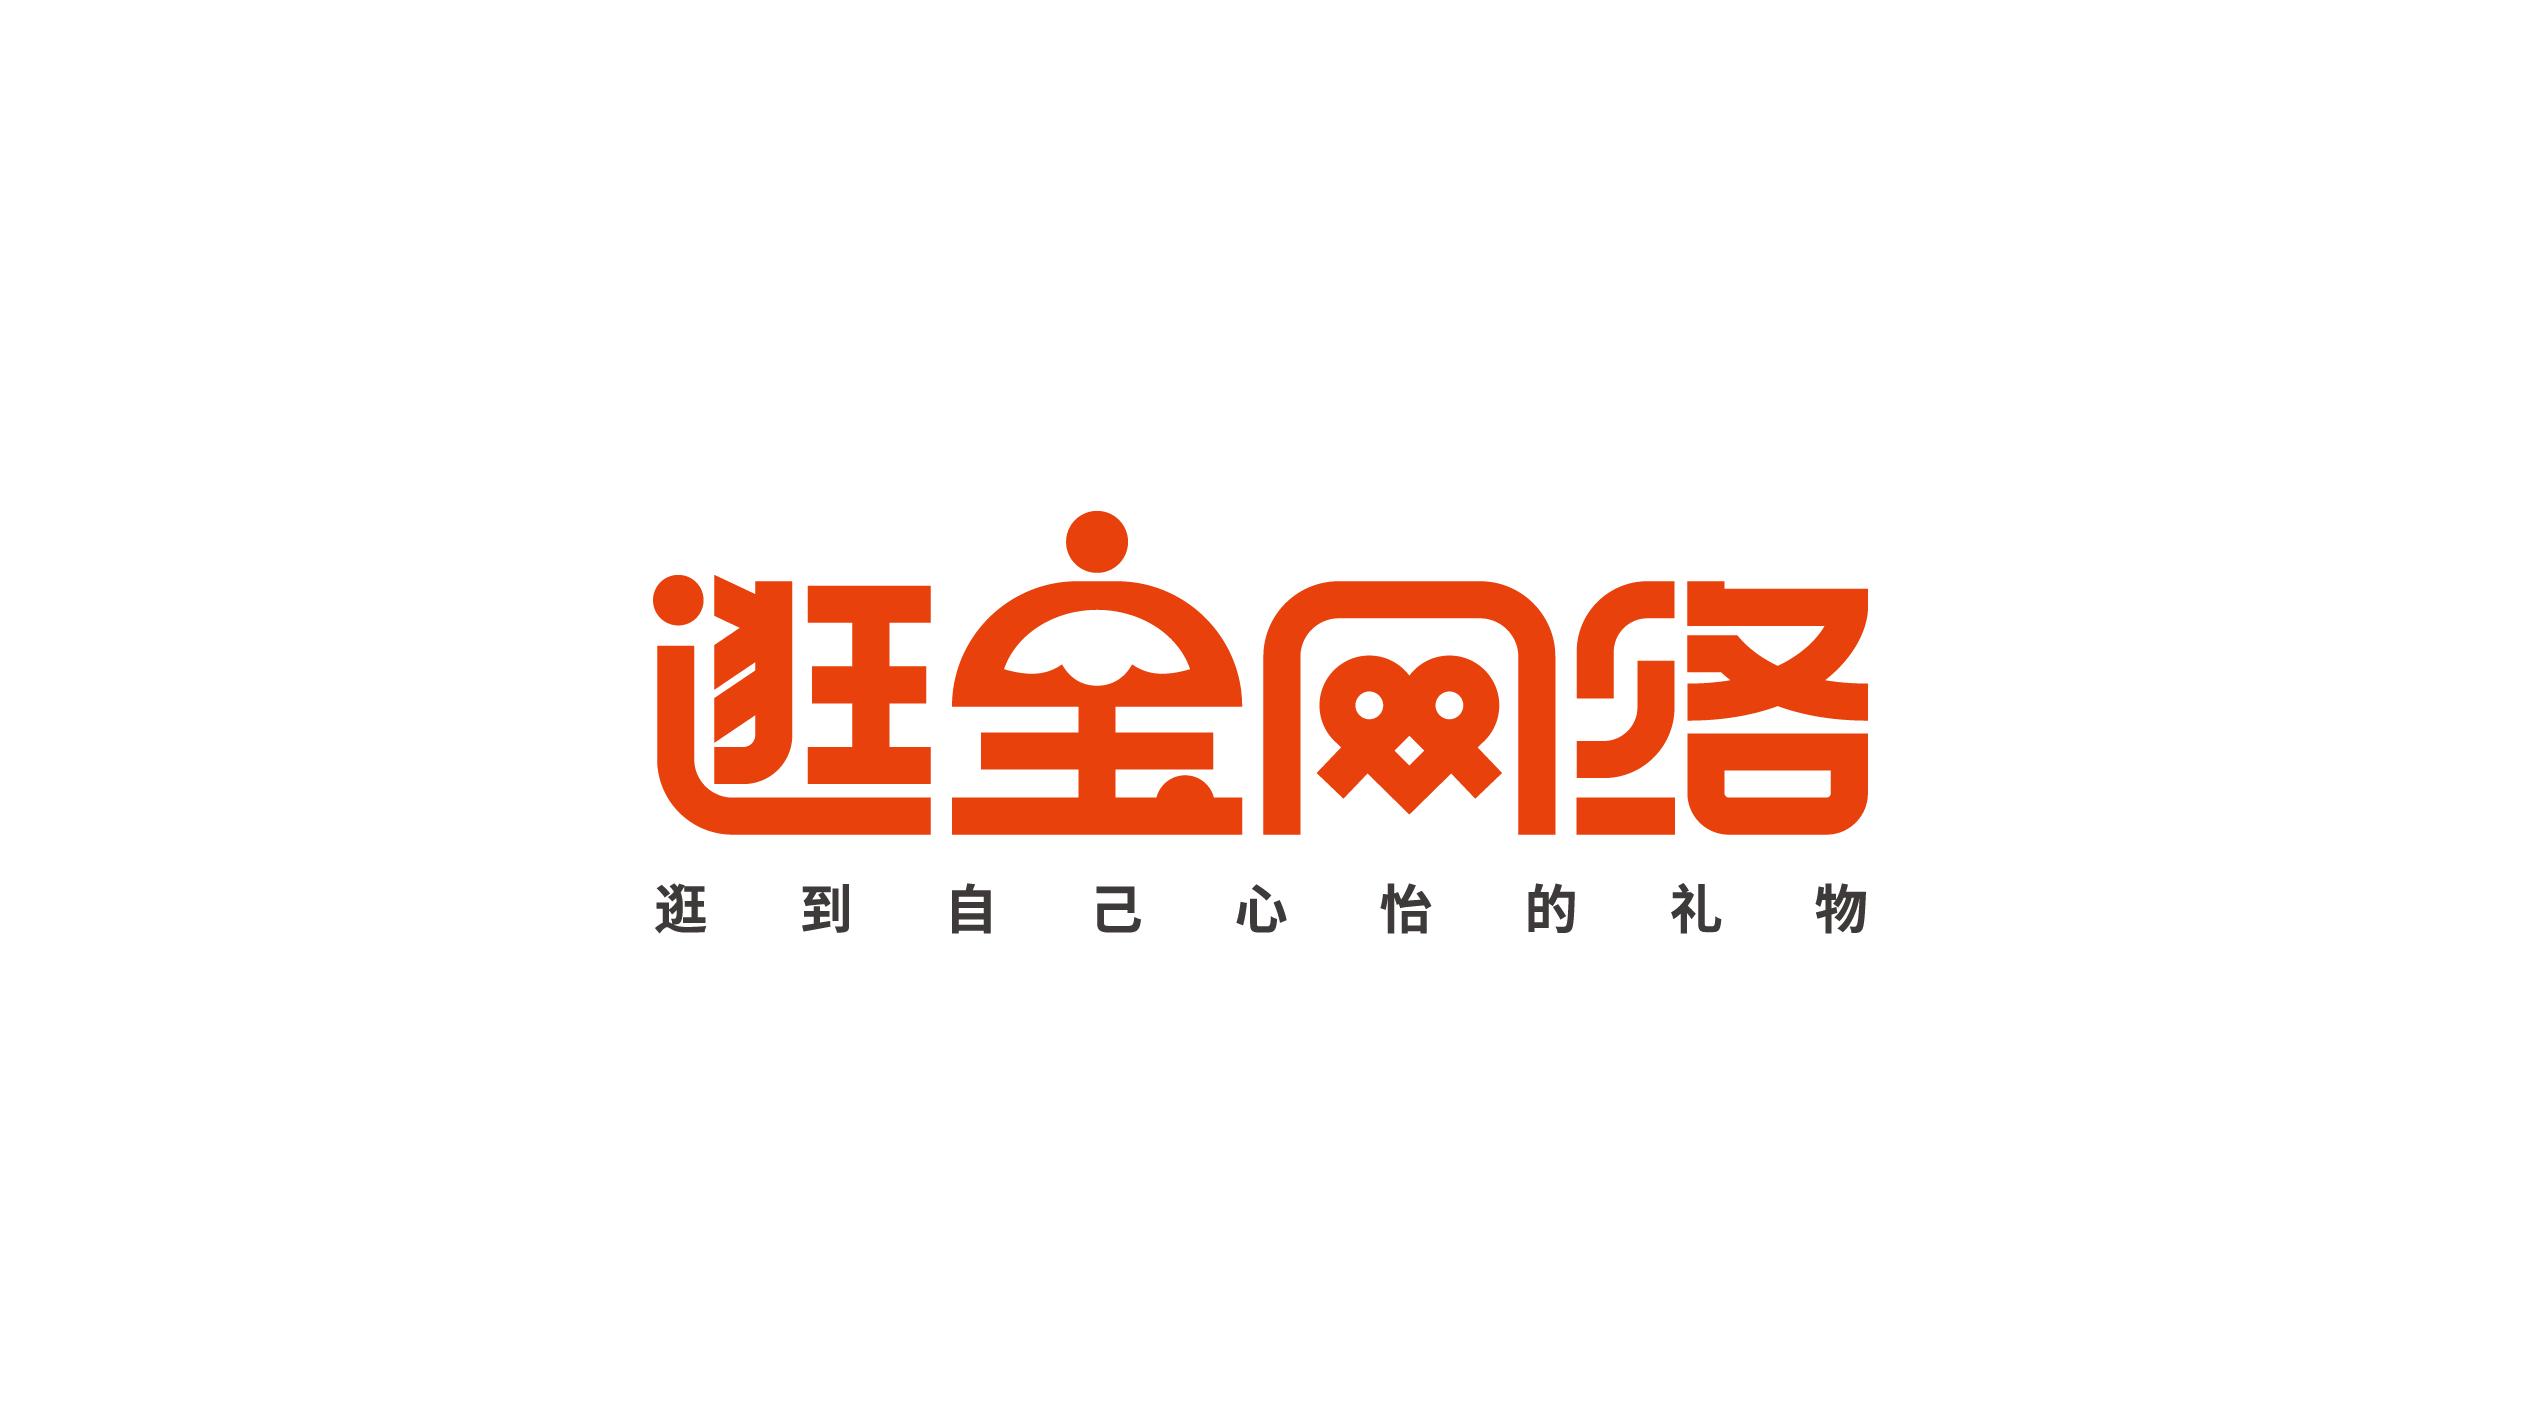 逛宝网络购物平台LOGO设计